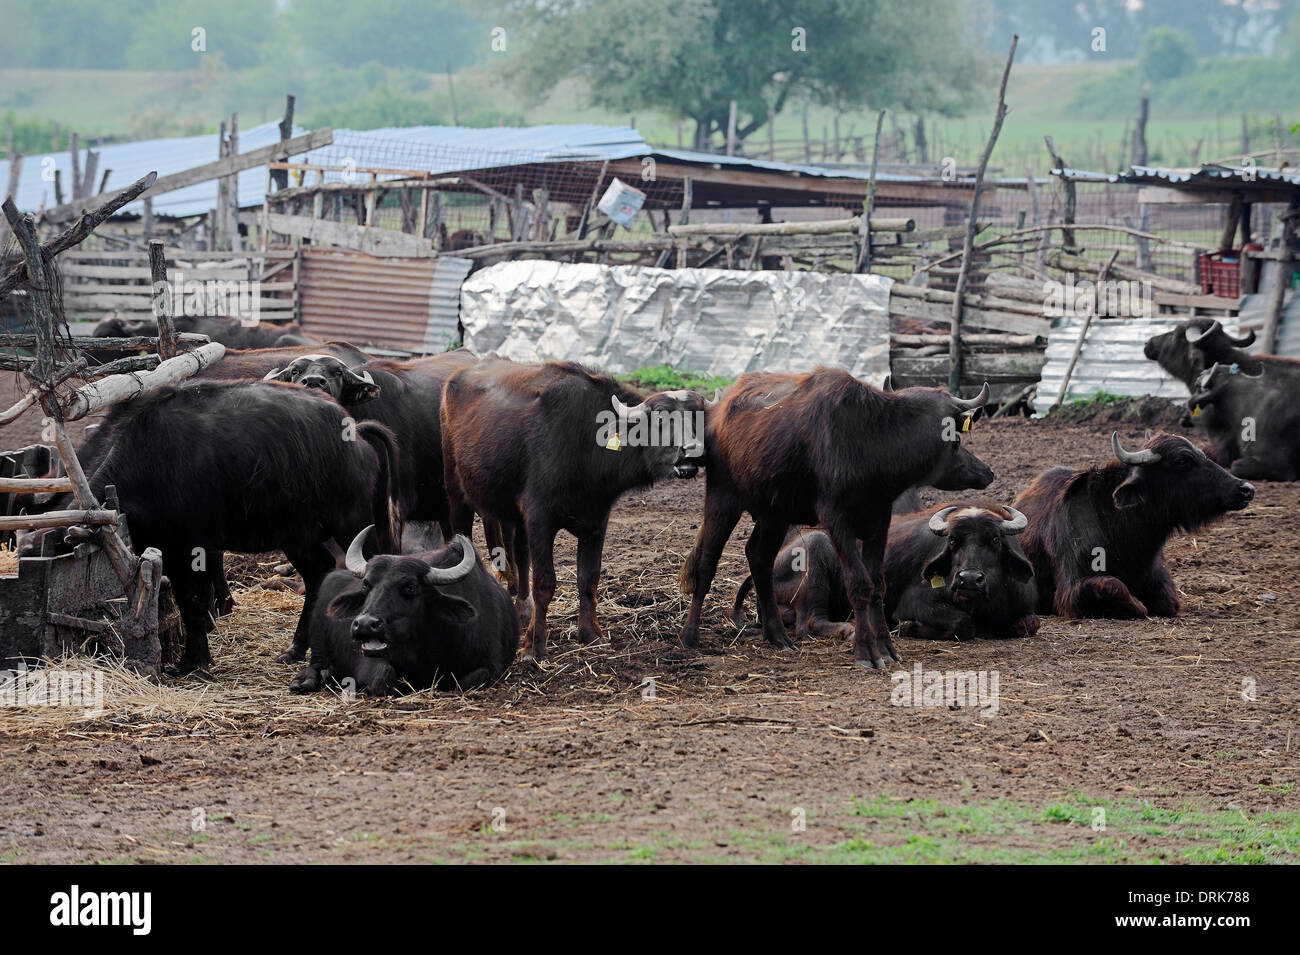 Asian Water Buffalo or Carabao (Bos arnee, Bubalus arnee), group, Greece, Europe - Stock Image